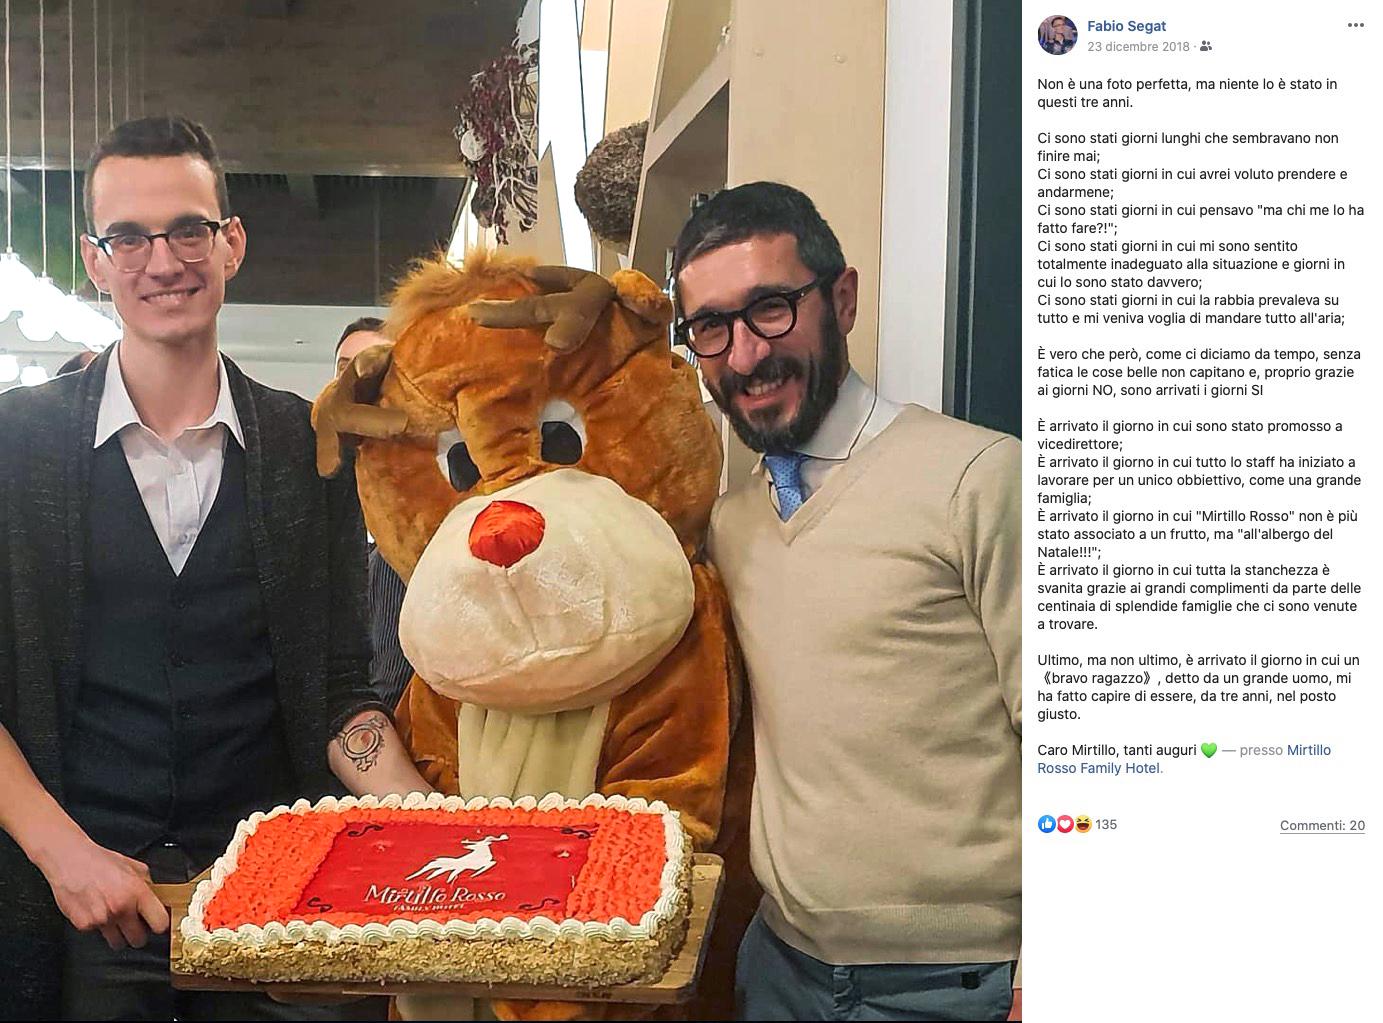 Personal storytelling, Mirtillo Rosso, Fabio Segat